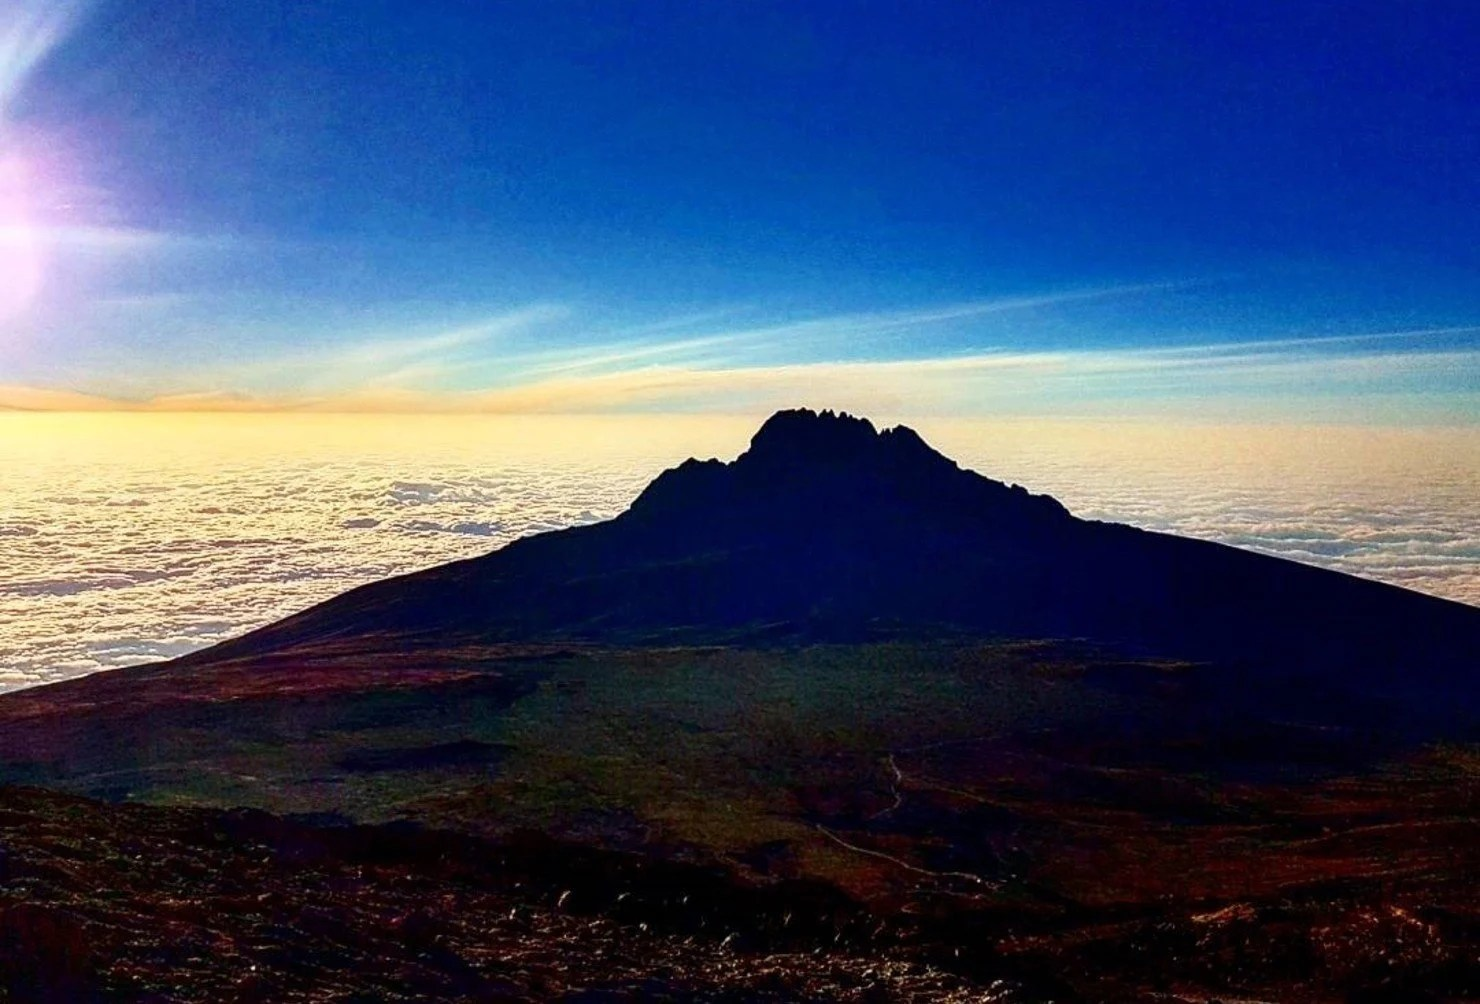 Climb Kilimanjaro Trek The Marangu Route In Tanzania